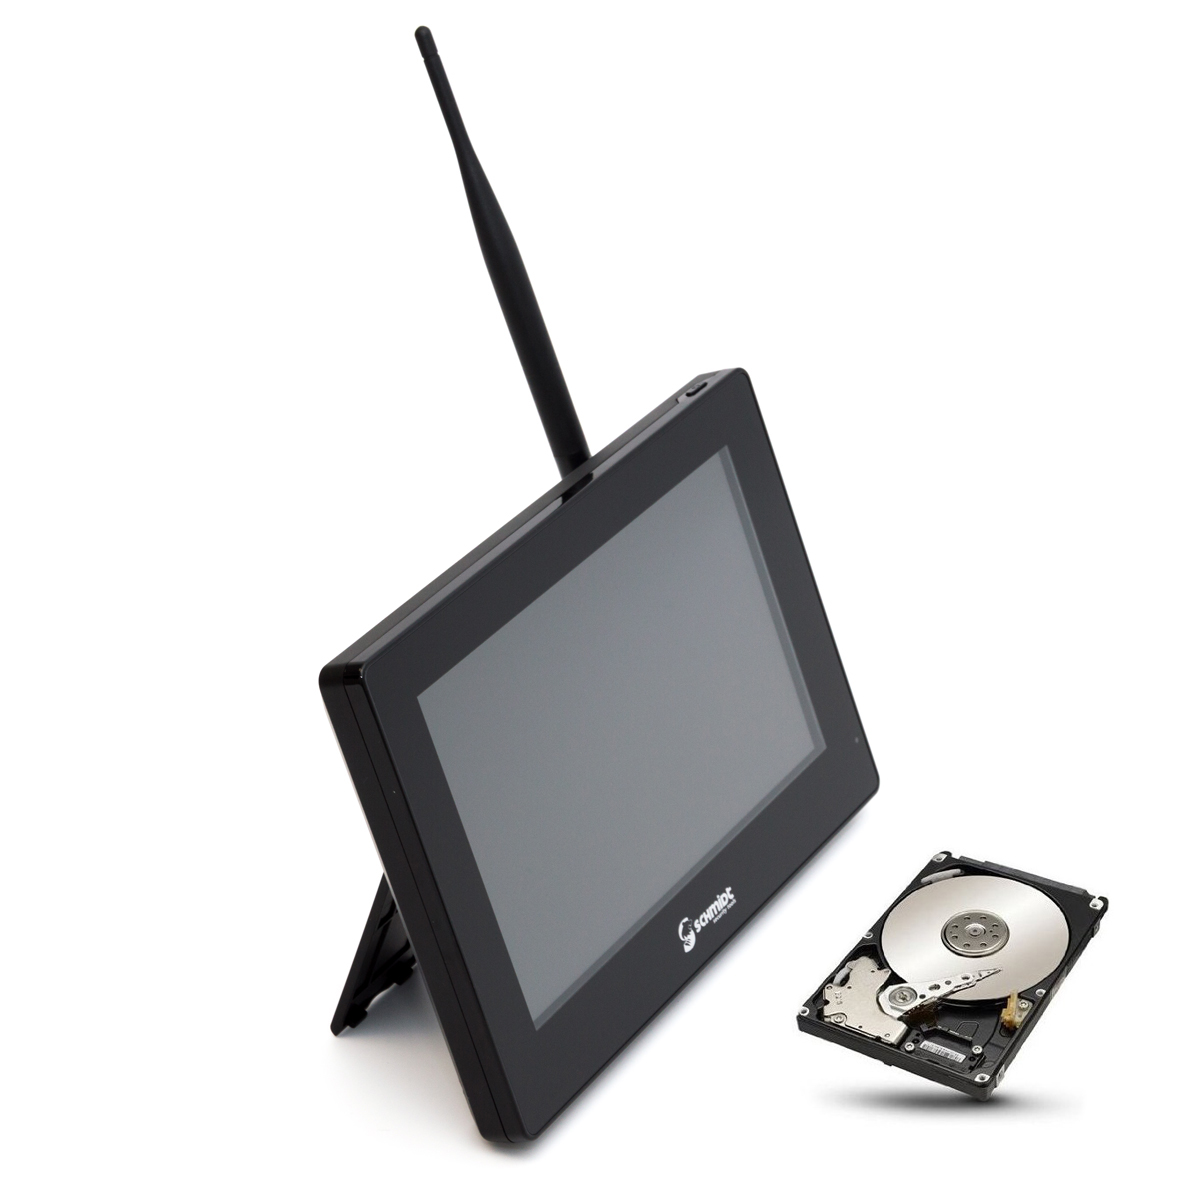 "SCHMIDT-Security-Tools Funk Überwachungssystem 3x Kamera 9"" Touch-Monitor mit Standfuß HD Videoüberwachungsanlage Drahtlos Überwachungsset Sicherheitssystem 1TB HDD Festplatte"